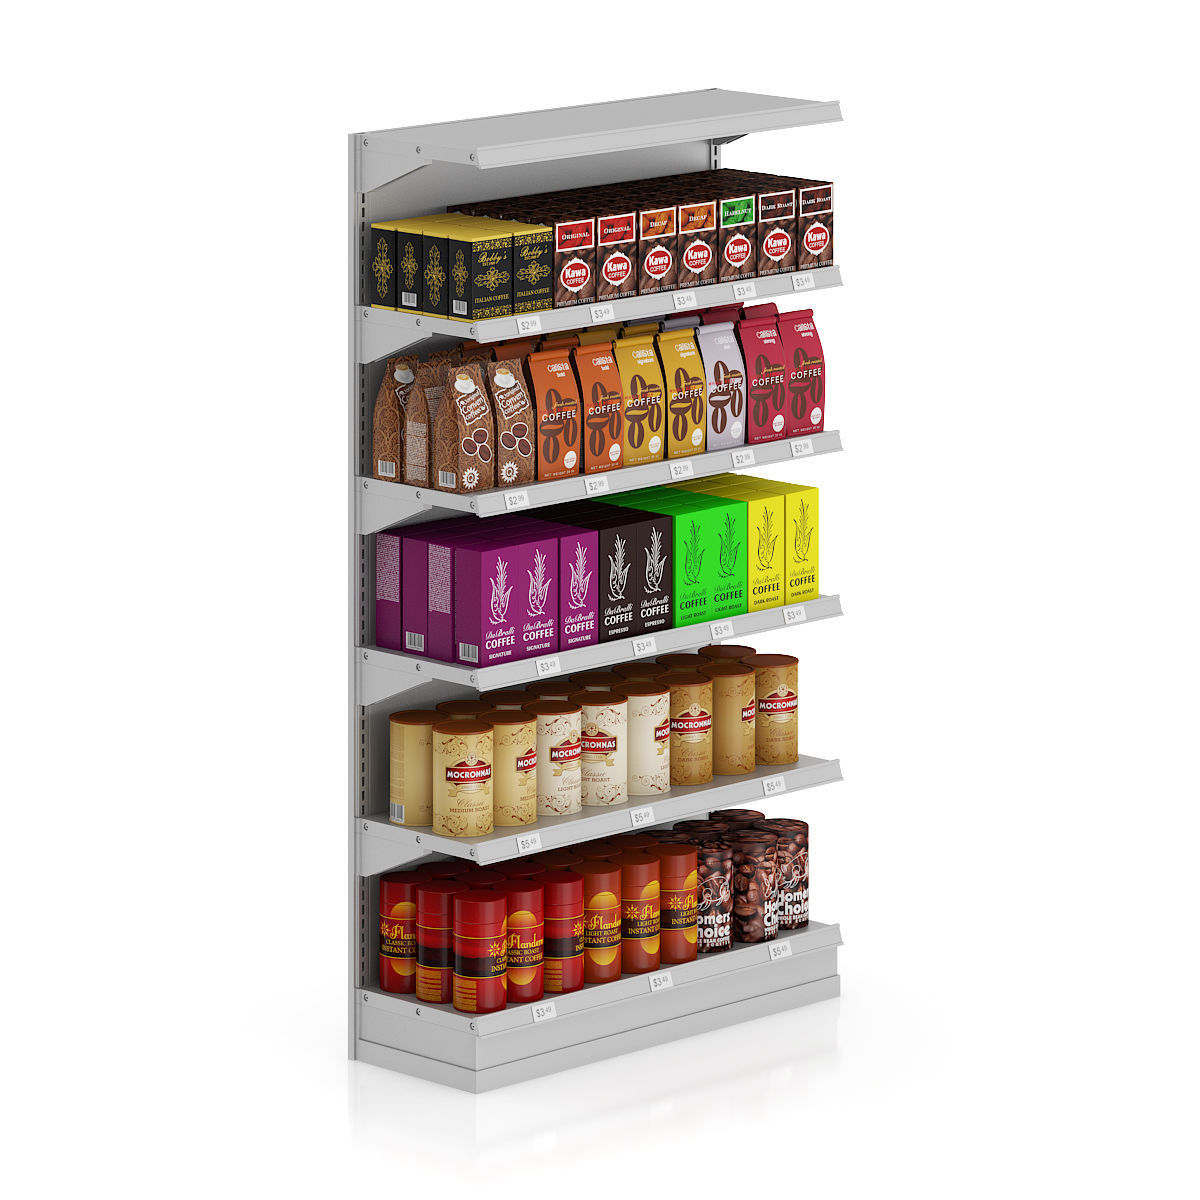 Market Shelf - Coffees